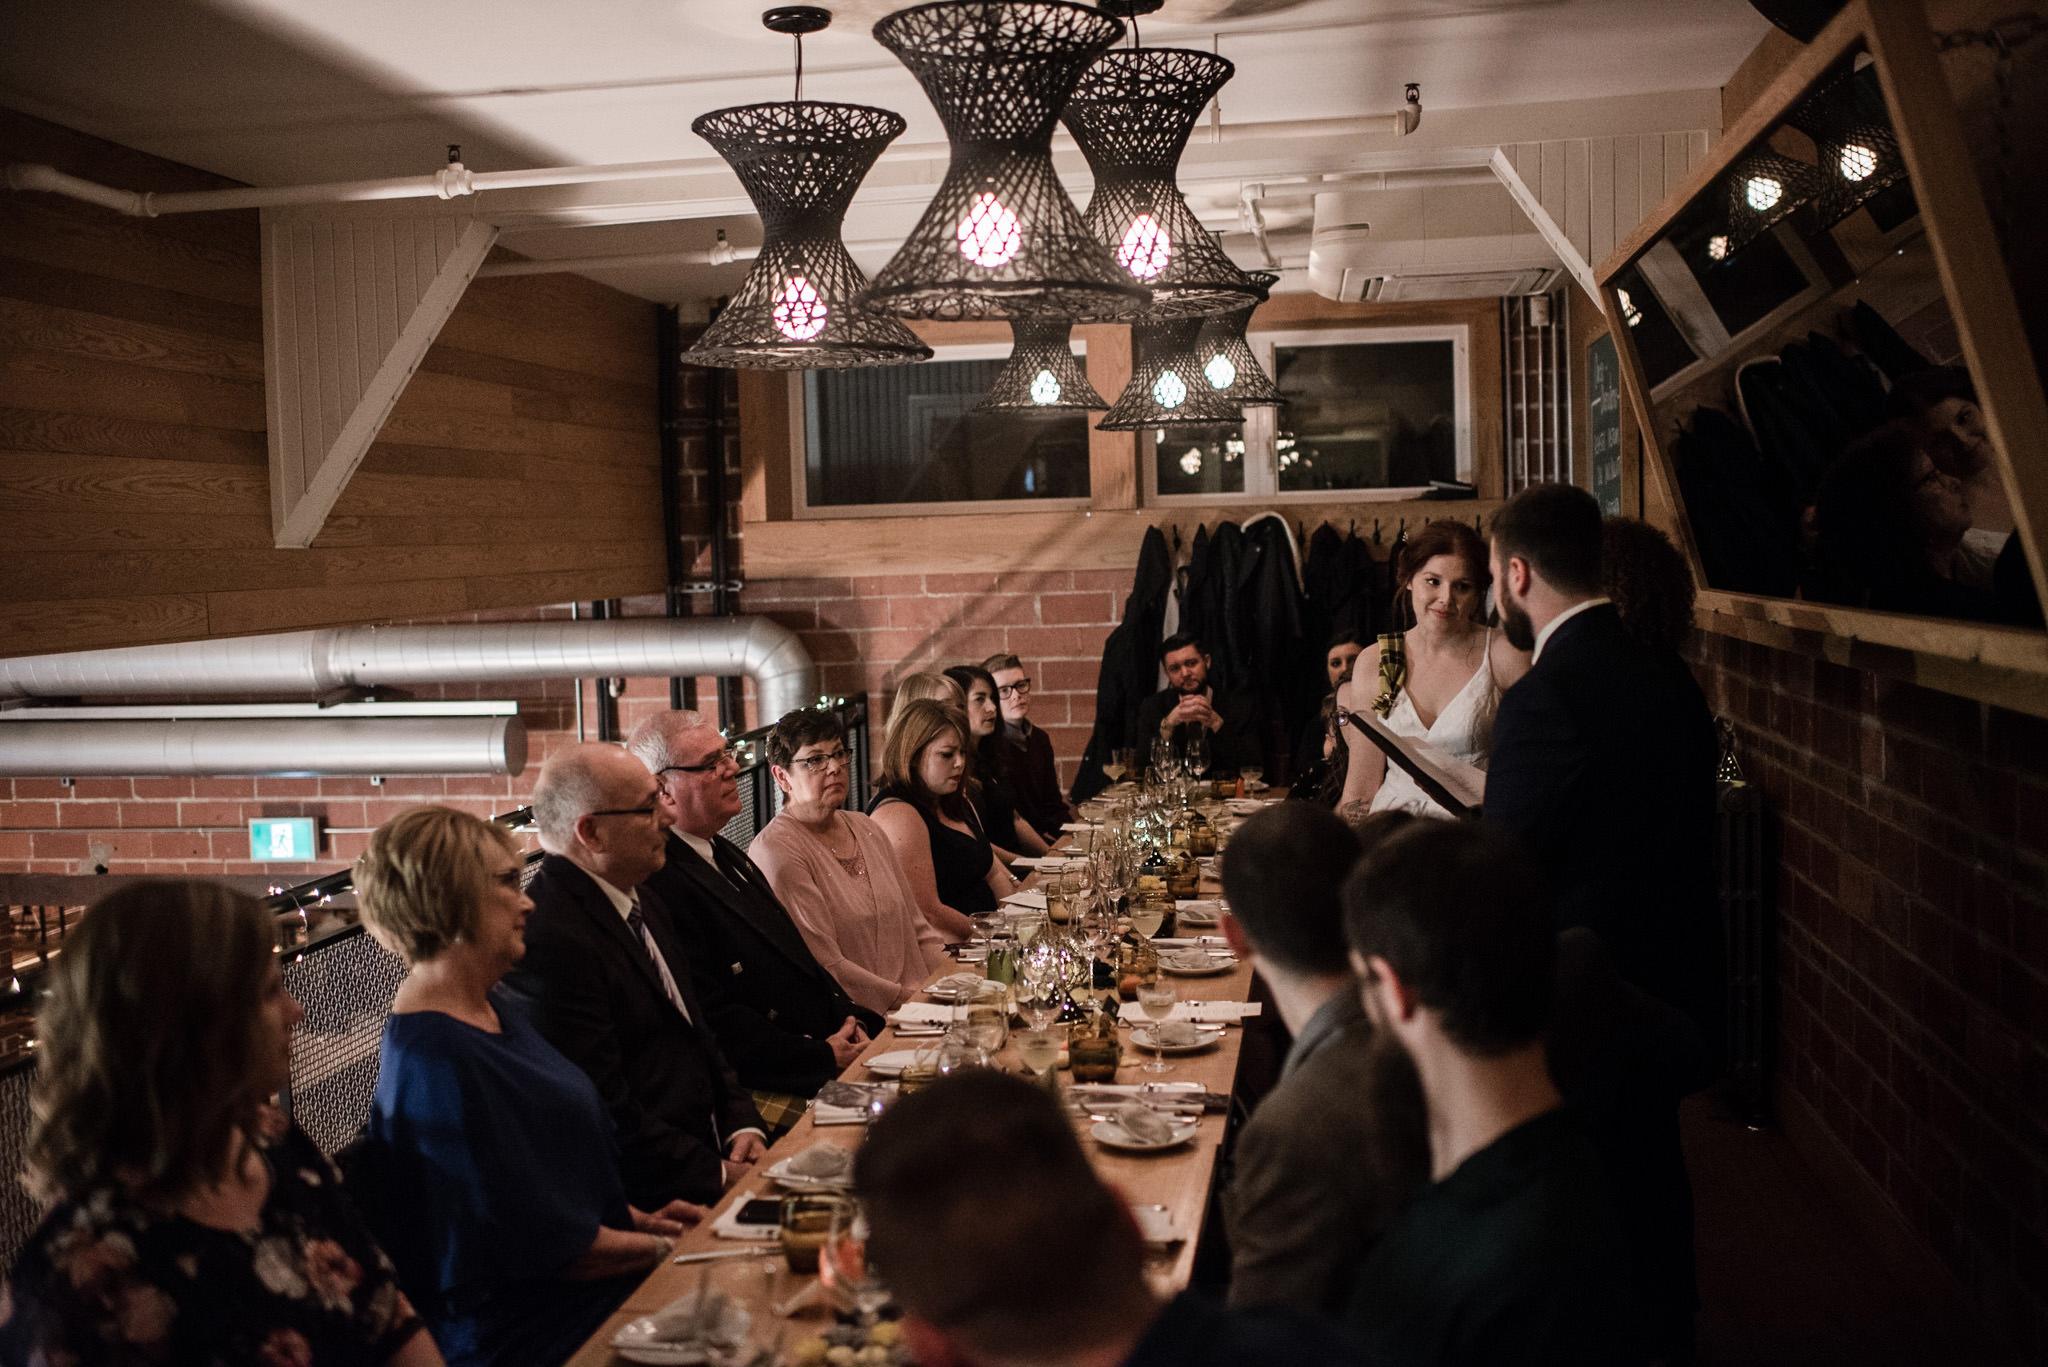 114-intimate-restaurant-wedding-toronto-wedding-photographer.jpg